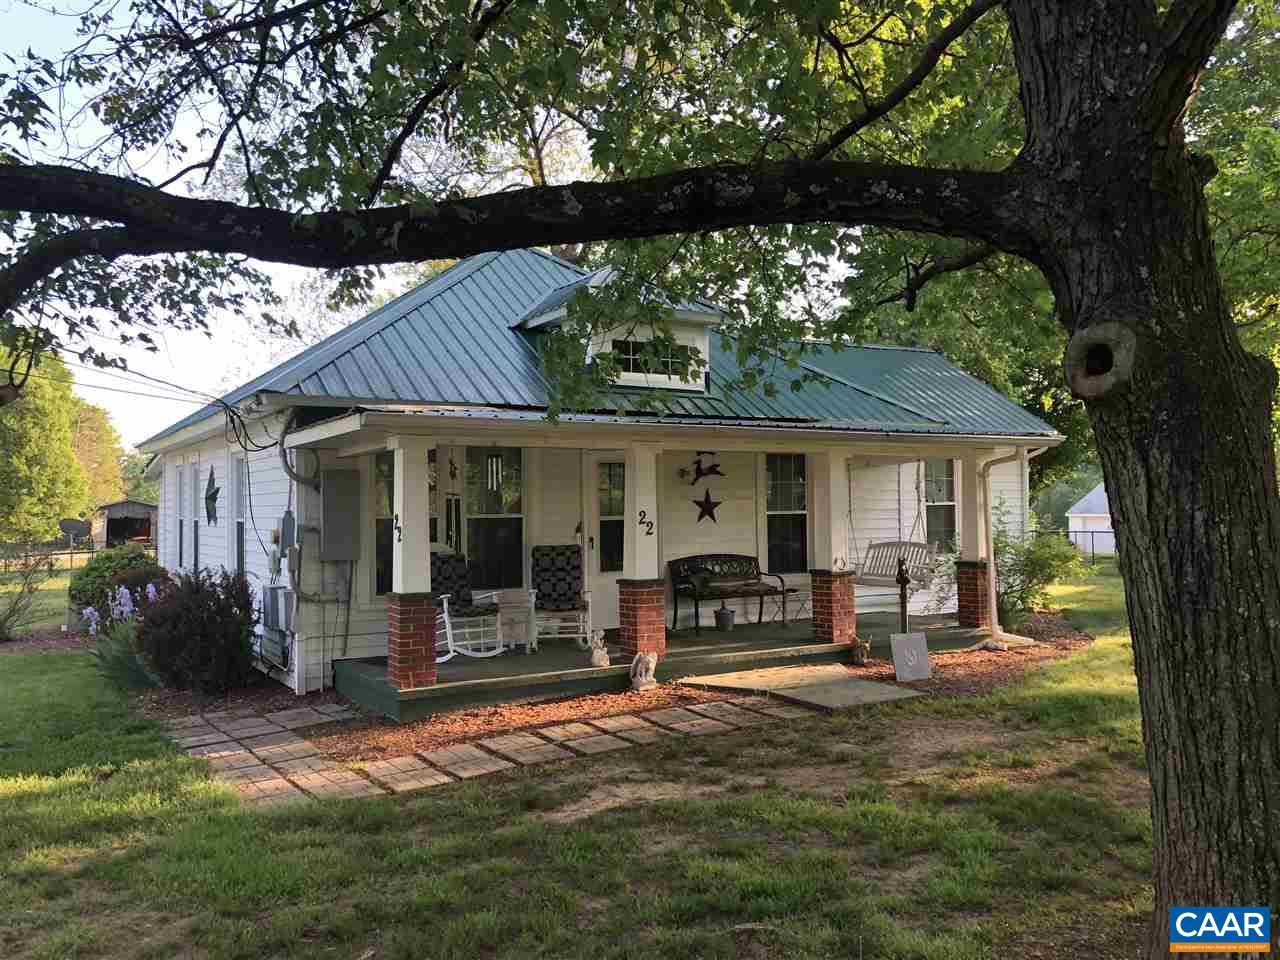 home for sale , MLS #577155, 22 Quarter Ln